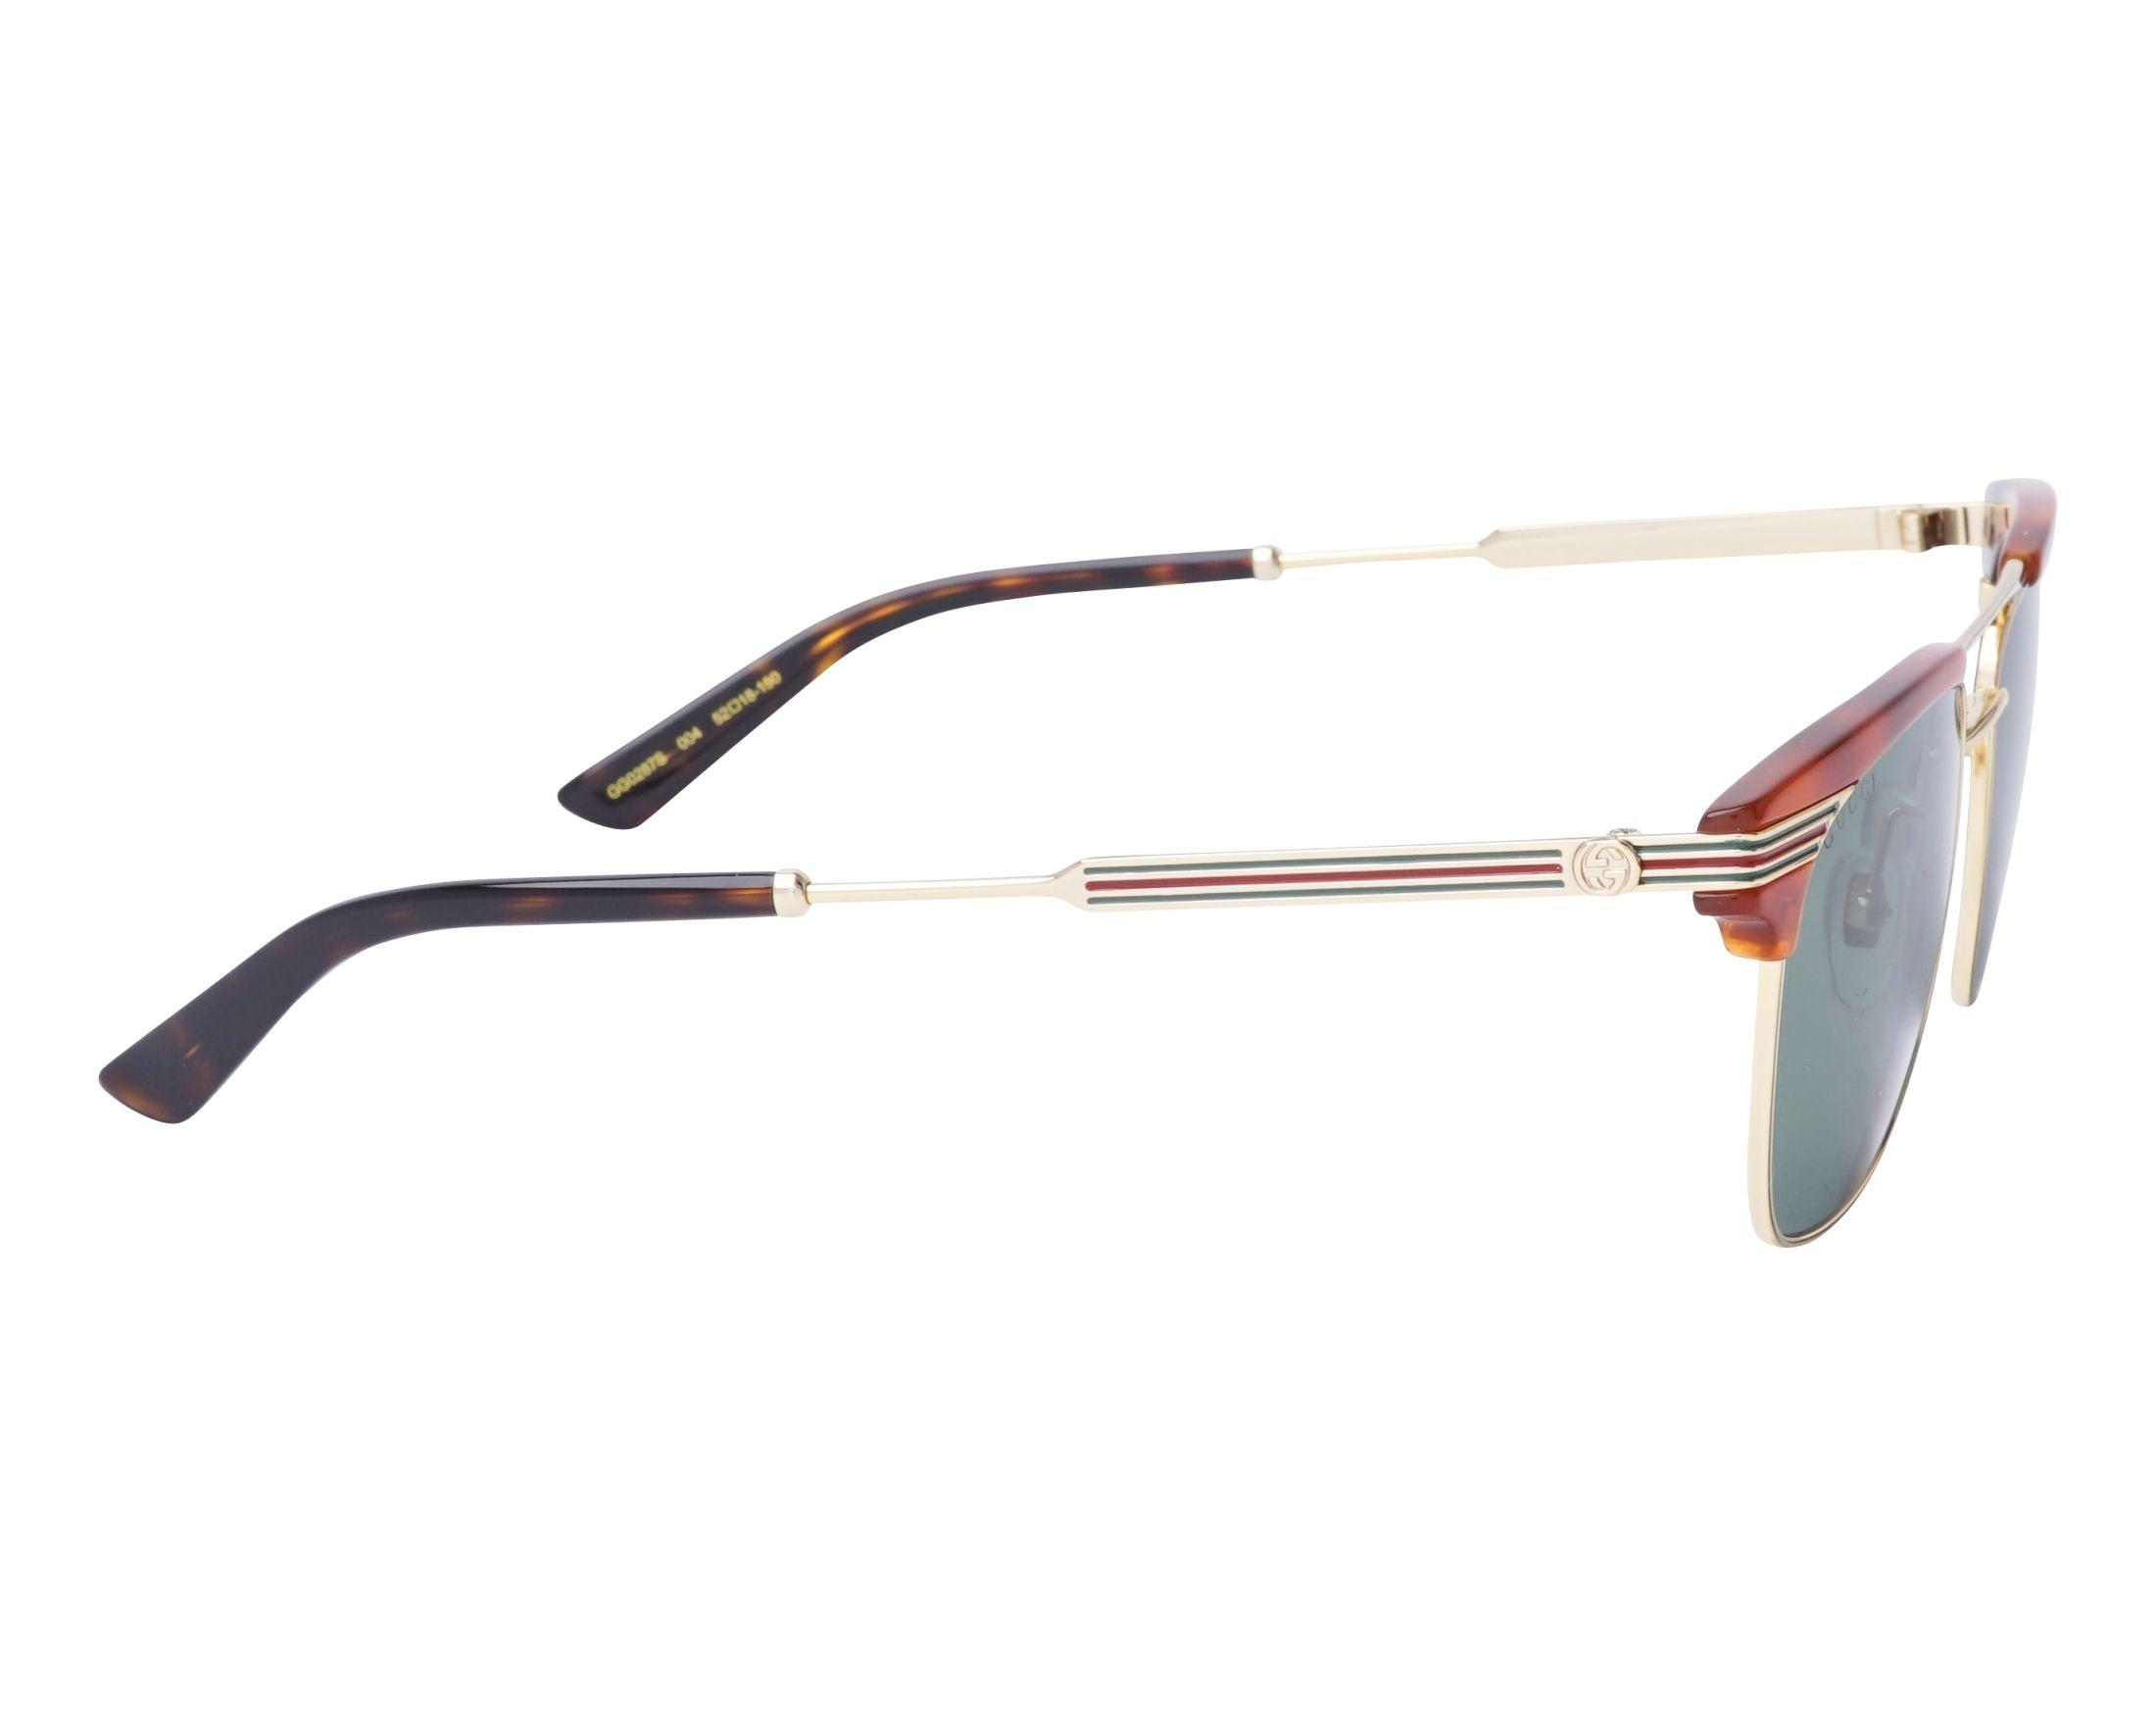 6bf35800cdb Sunglasses Gucci GG-0287-S 004 52-18 Havana Gold side view